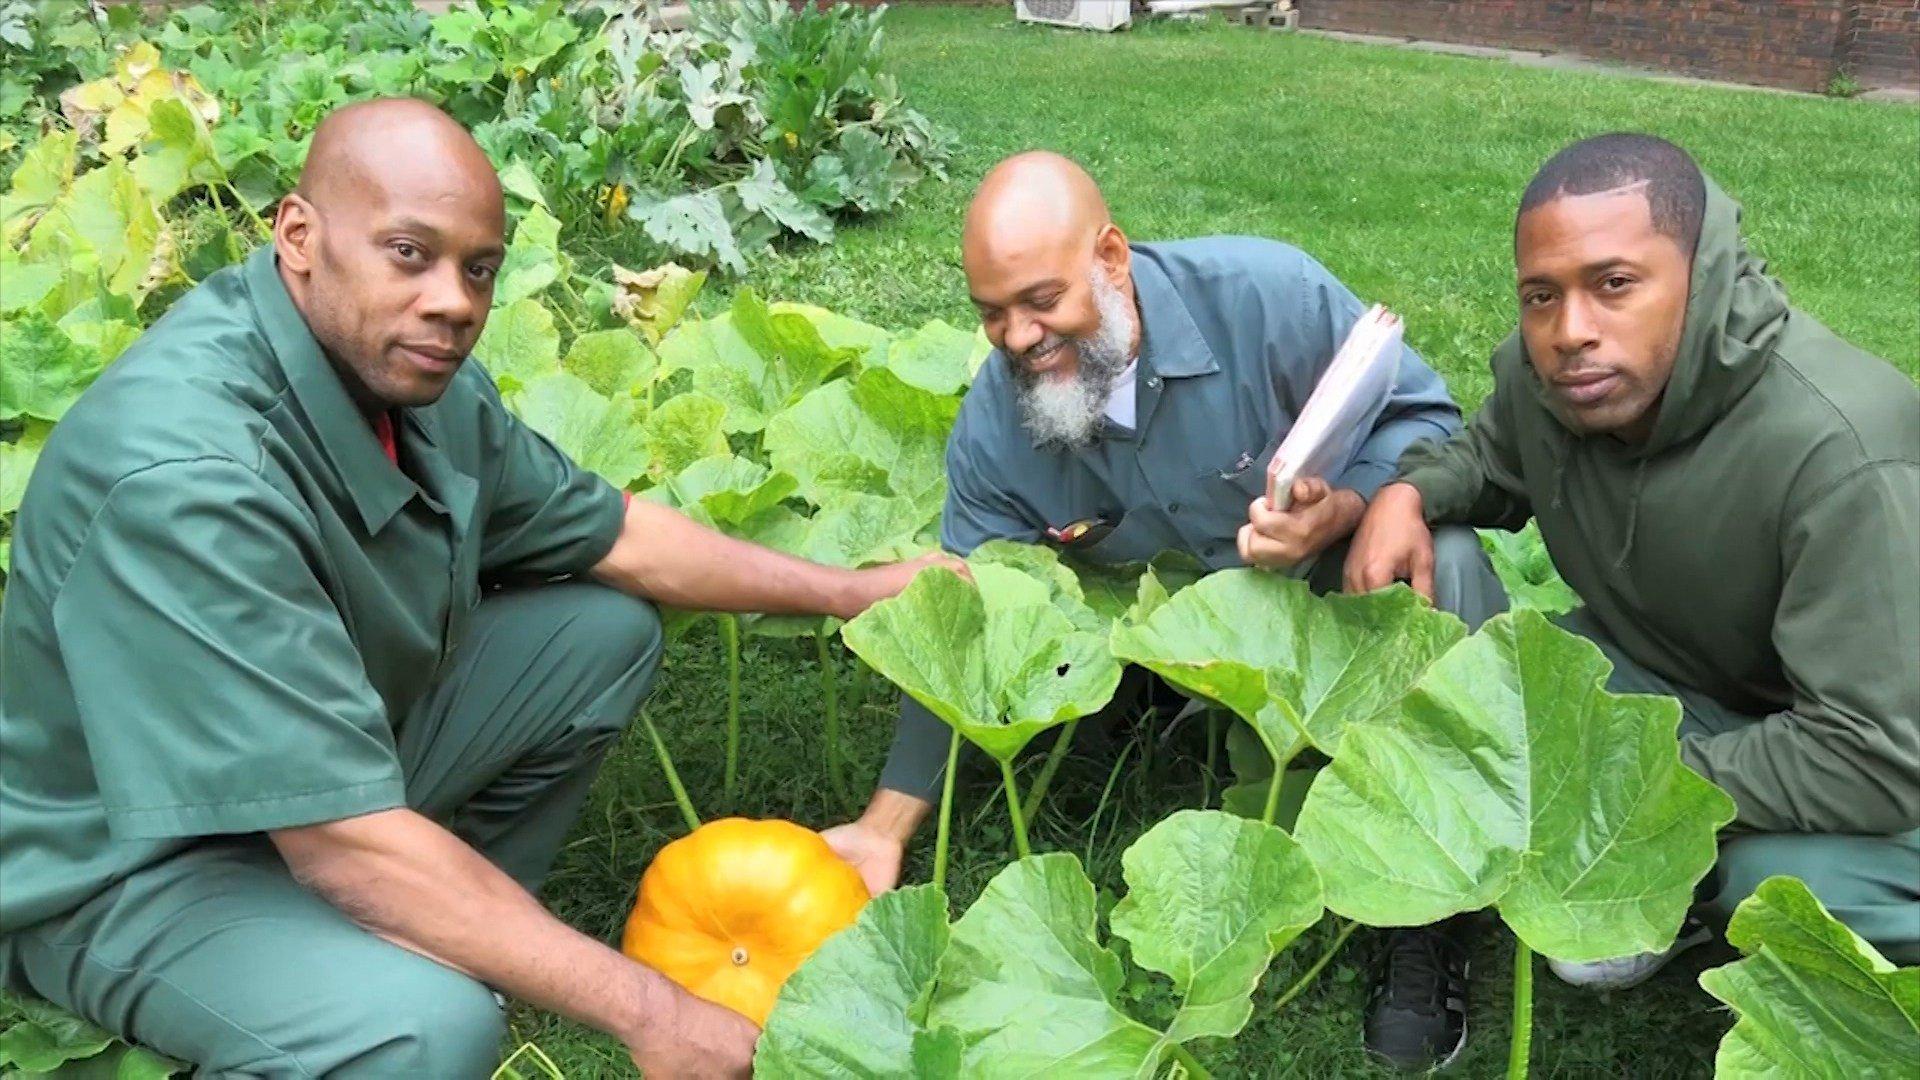 Will plant-based prison diet improve inmate behavior?